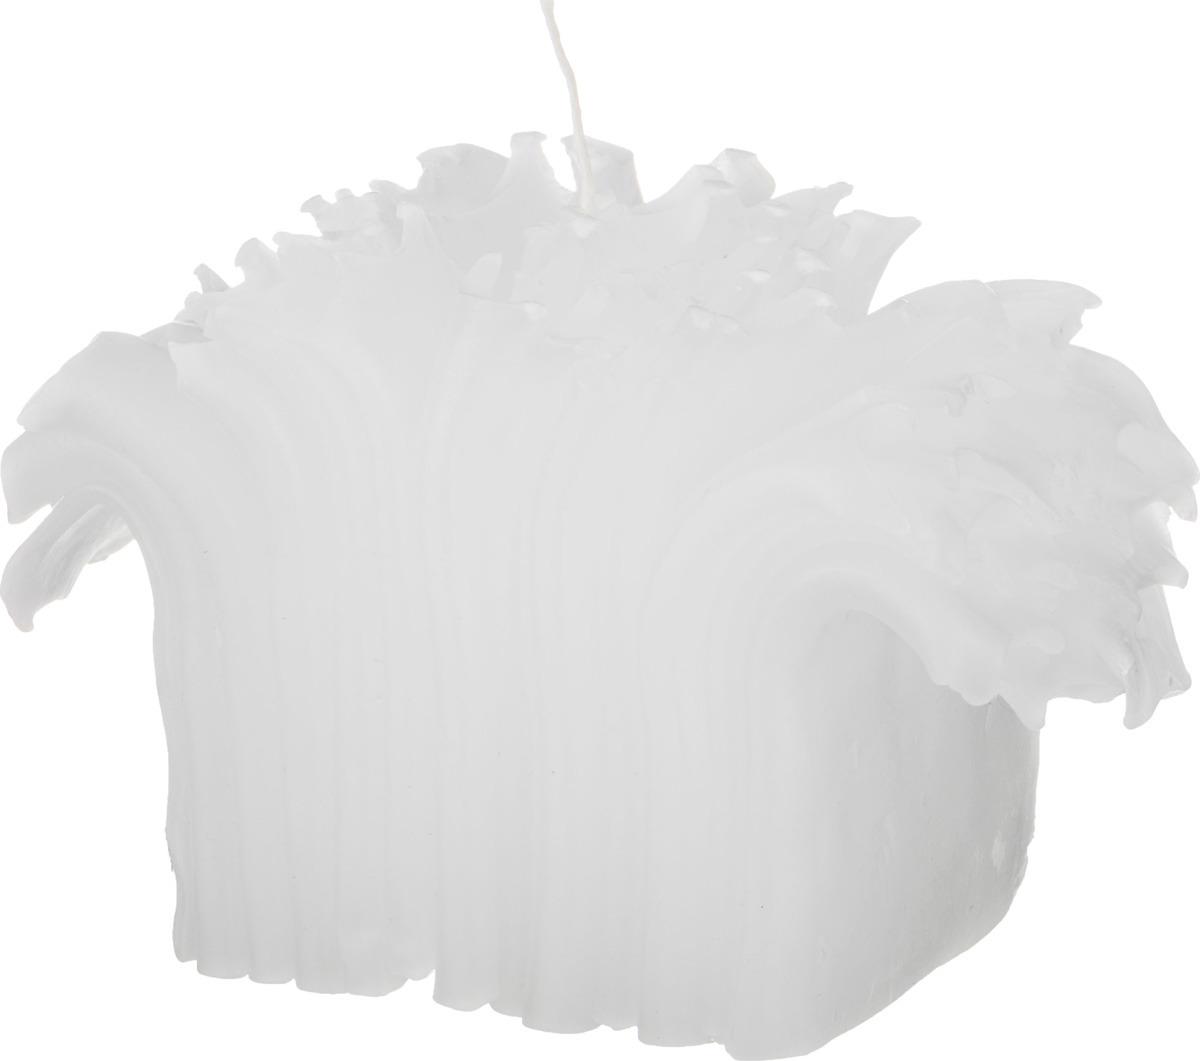 Свеча фигурная Lefard Лозанна, 315-100, белый, 12 х 7 х 8 см подстаканник сергей 11 8 х 7 8 х 7 3 см 2494361